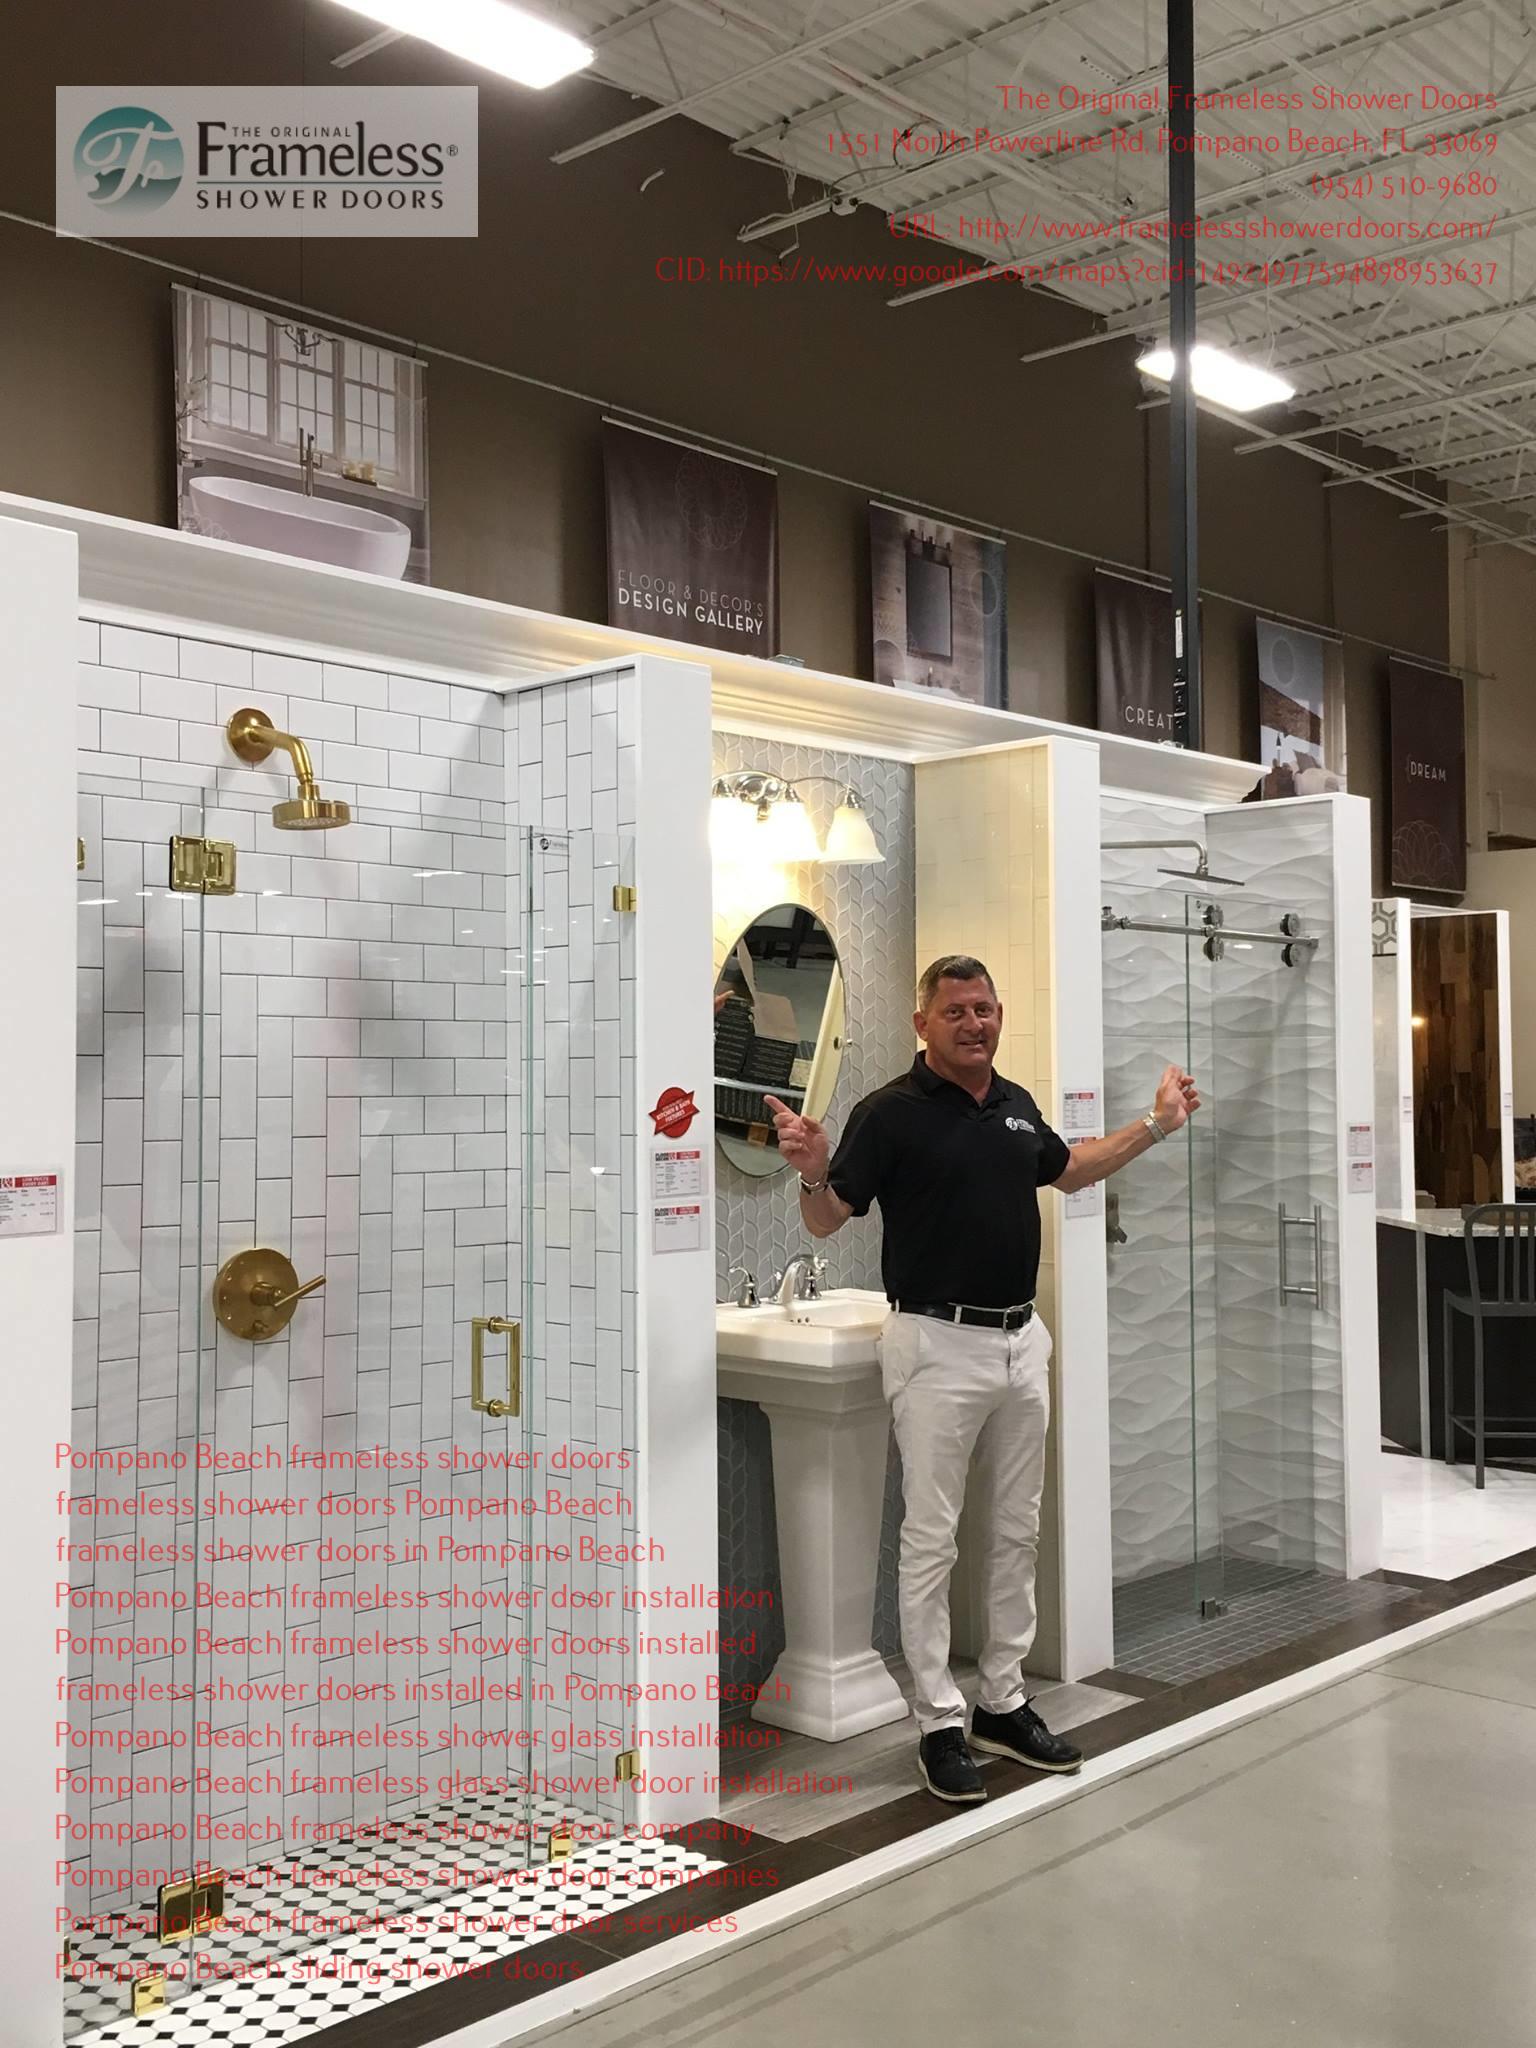 The Original Frameless Shower Doors Explains Why Frameless Doors Are the Way to Go